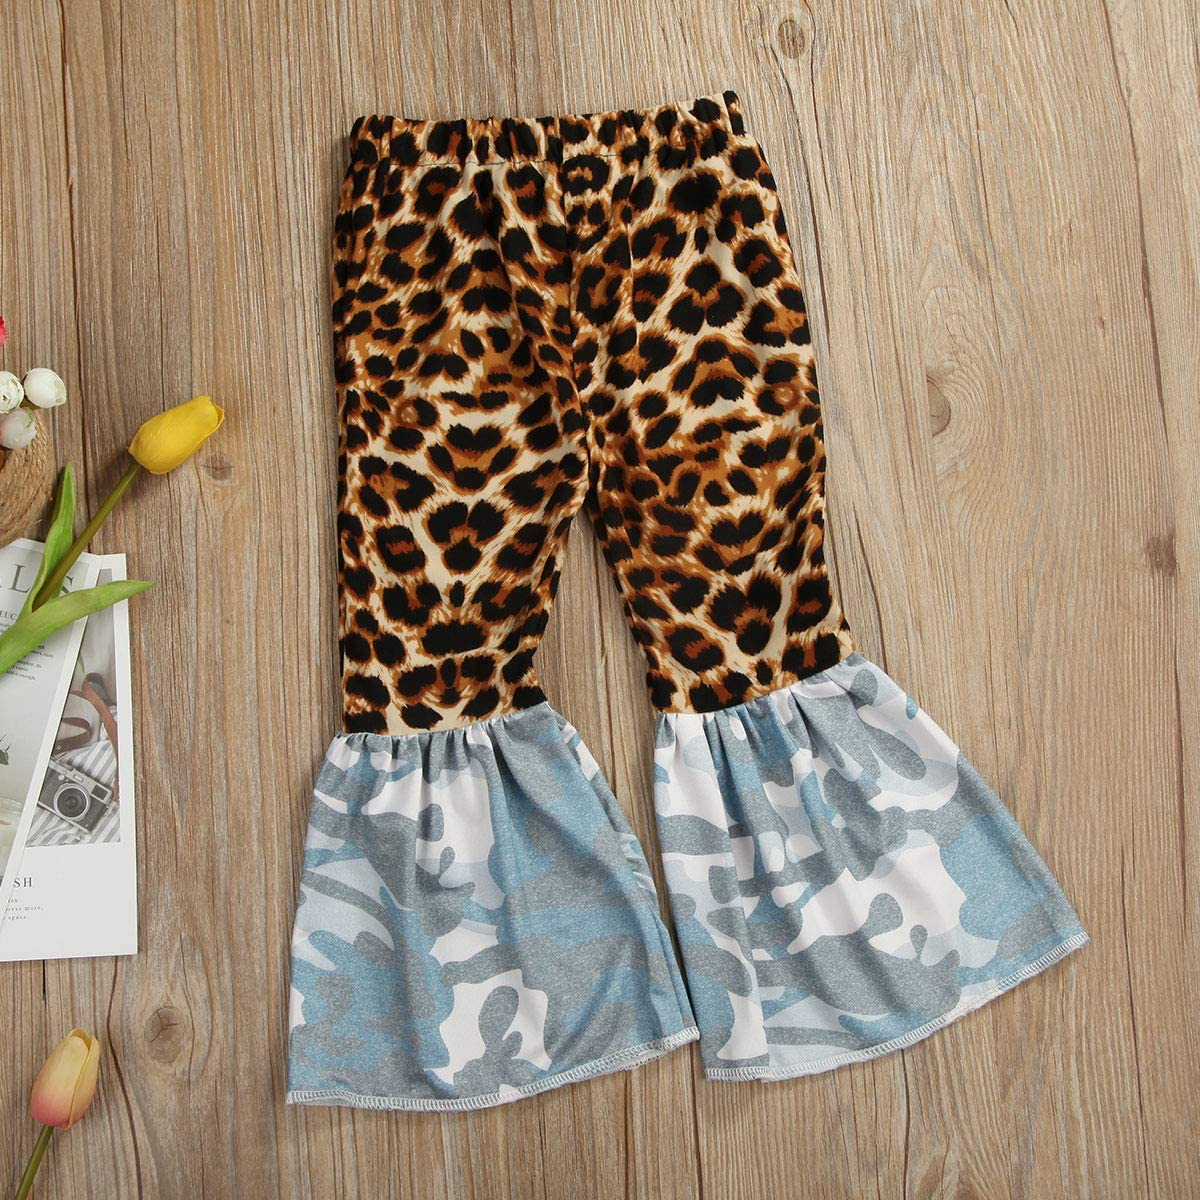 TSEXIEFOOFU Baby Girls Leopard Print Bell Bottoms Flare Pants Denim Jeans Ruffle Leggings